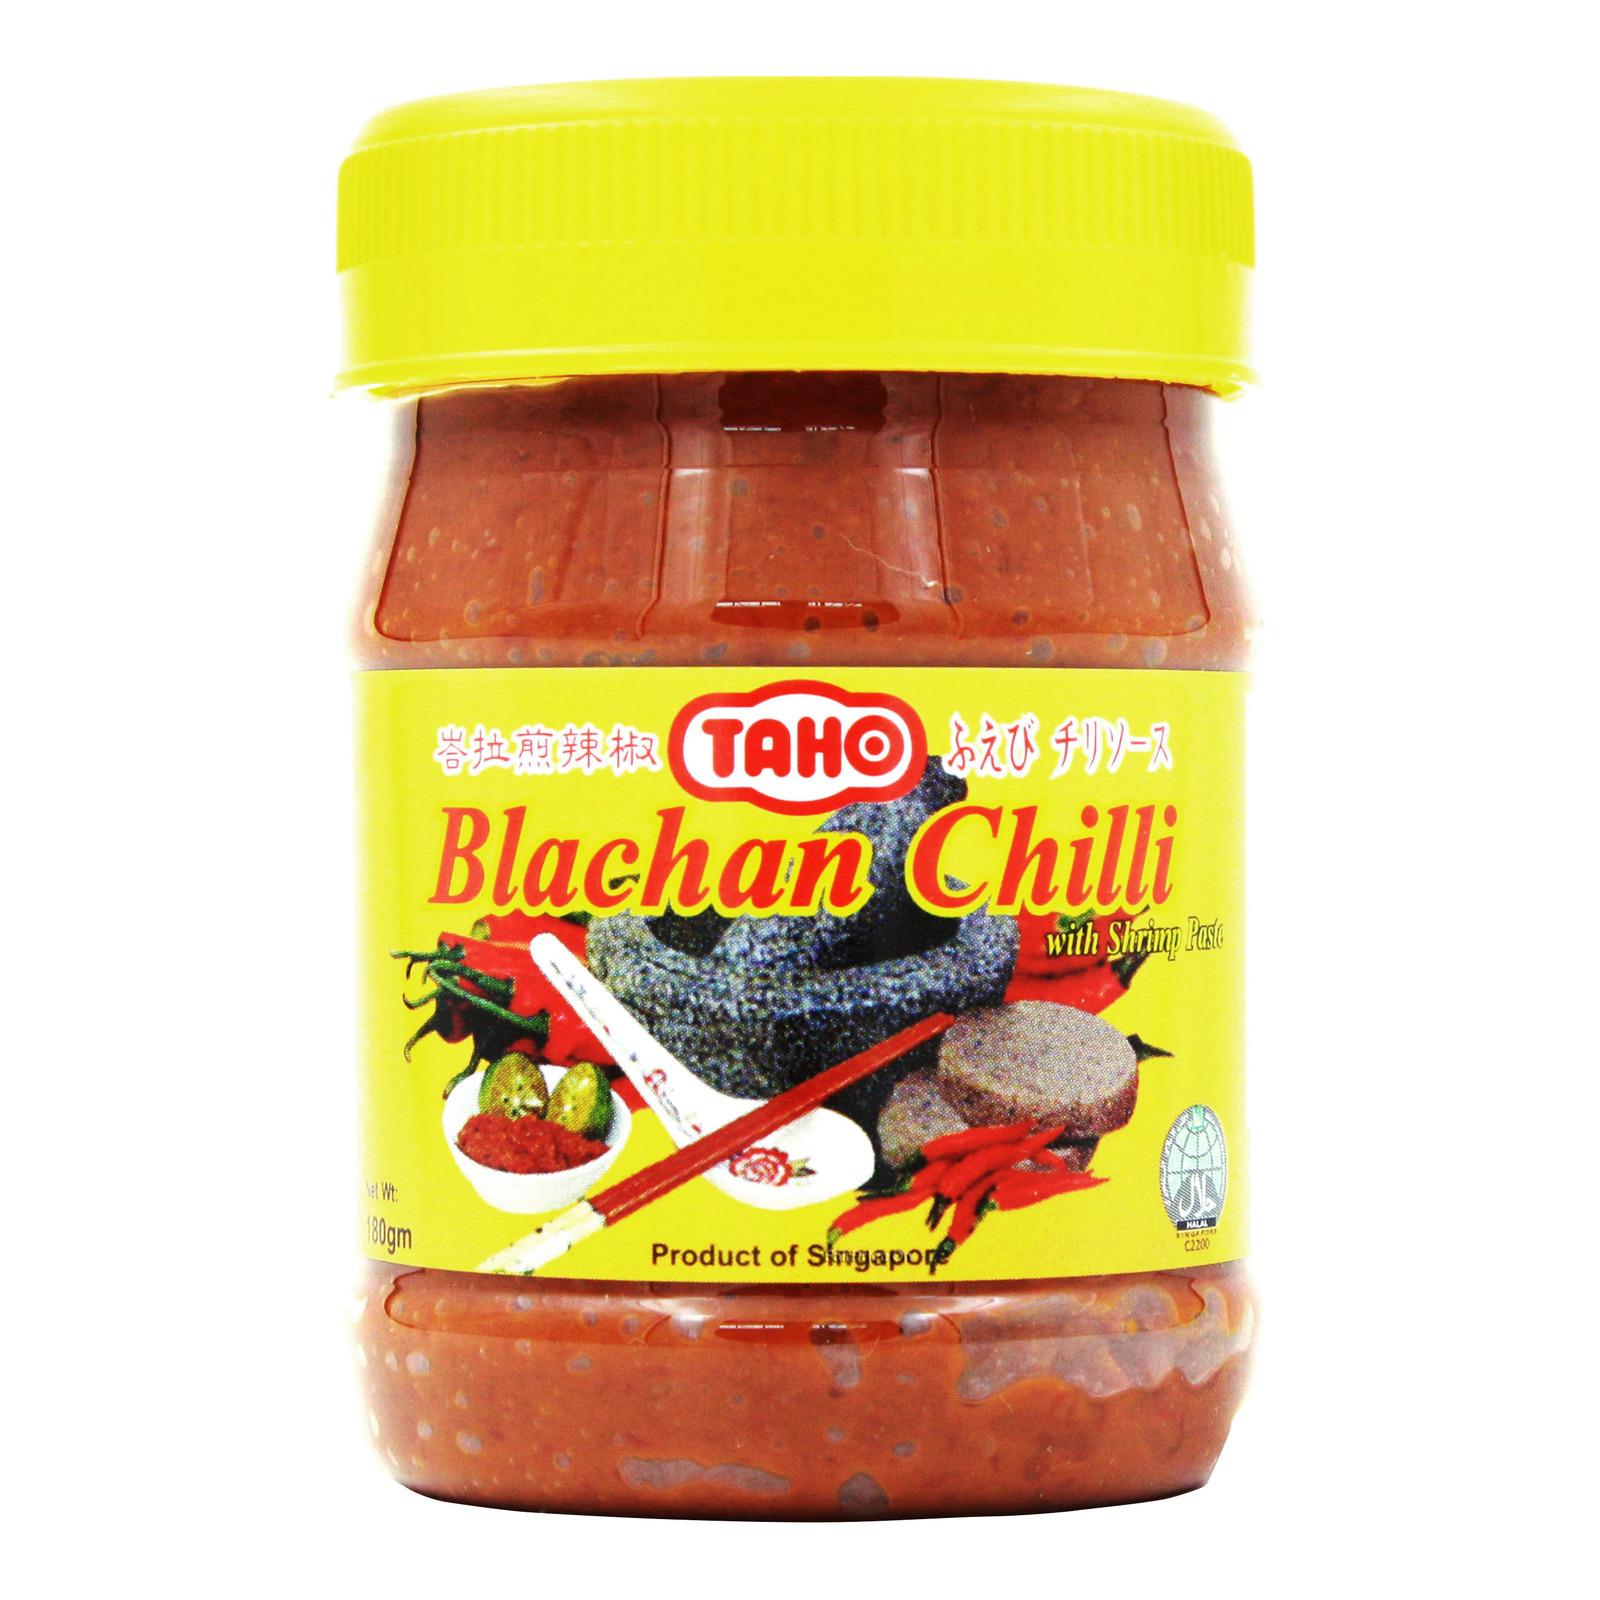 Taho Blachan Chili with Shrimp Paste